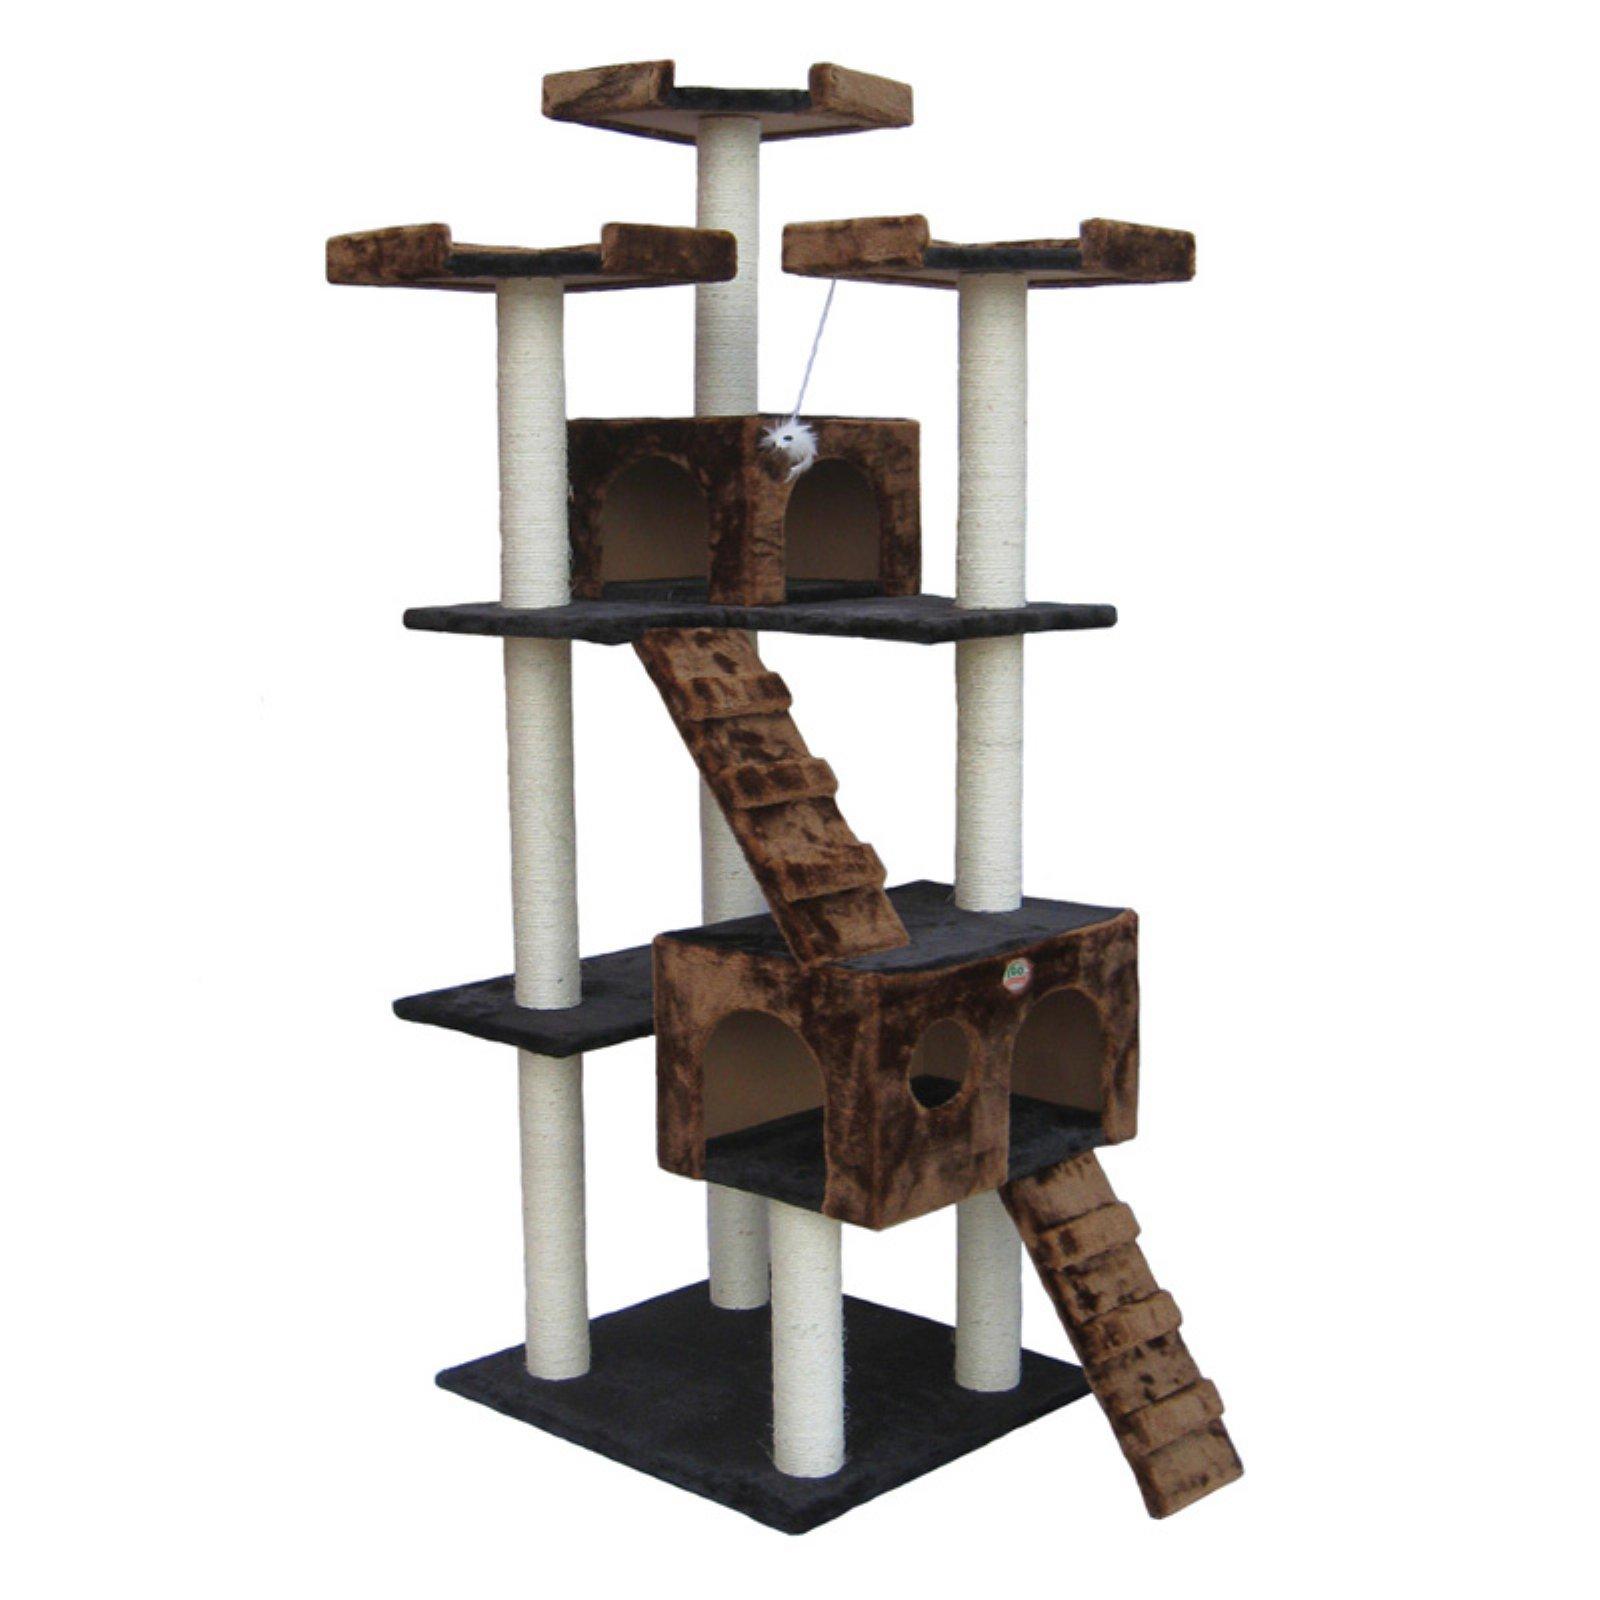 "Go Pet Club 72"" Cat Tree Condo Furniture Brown/Black Color"